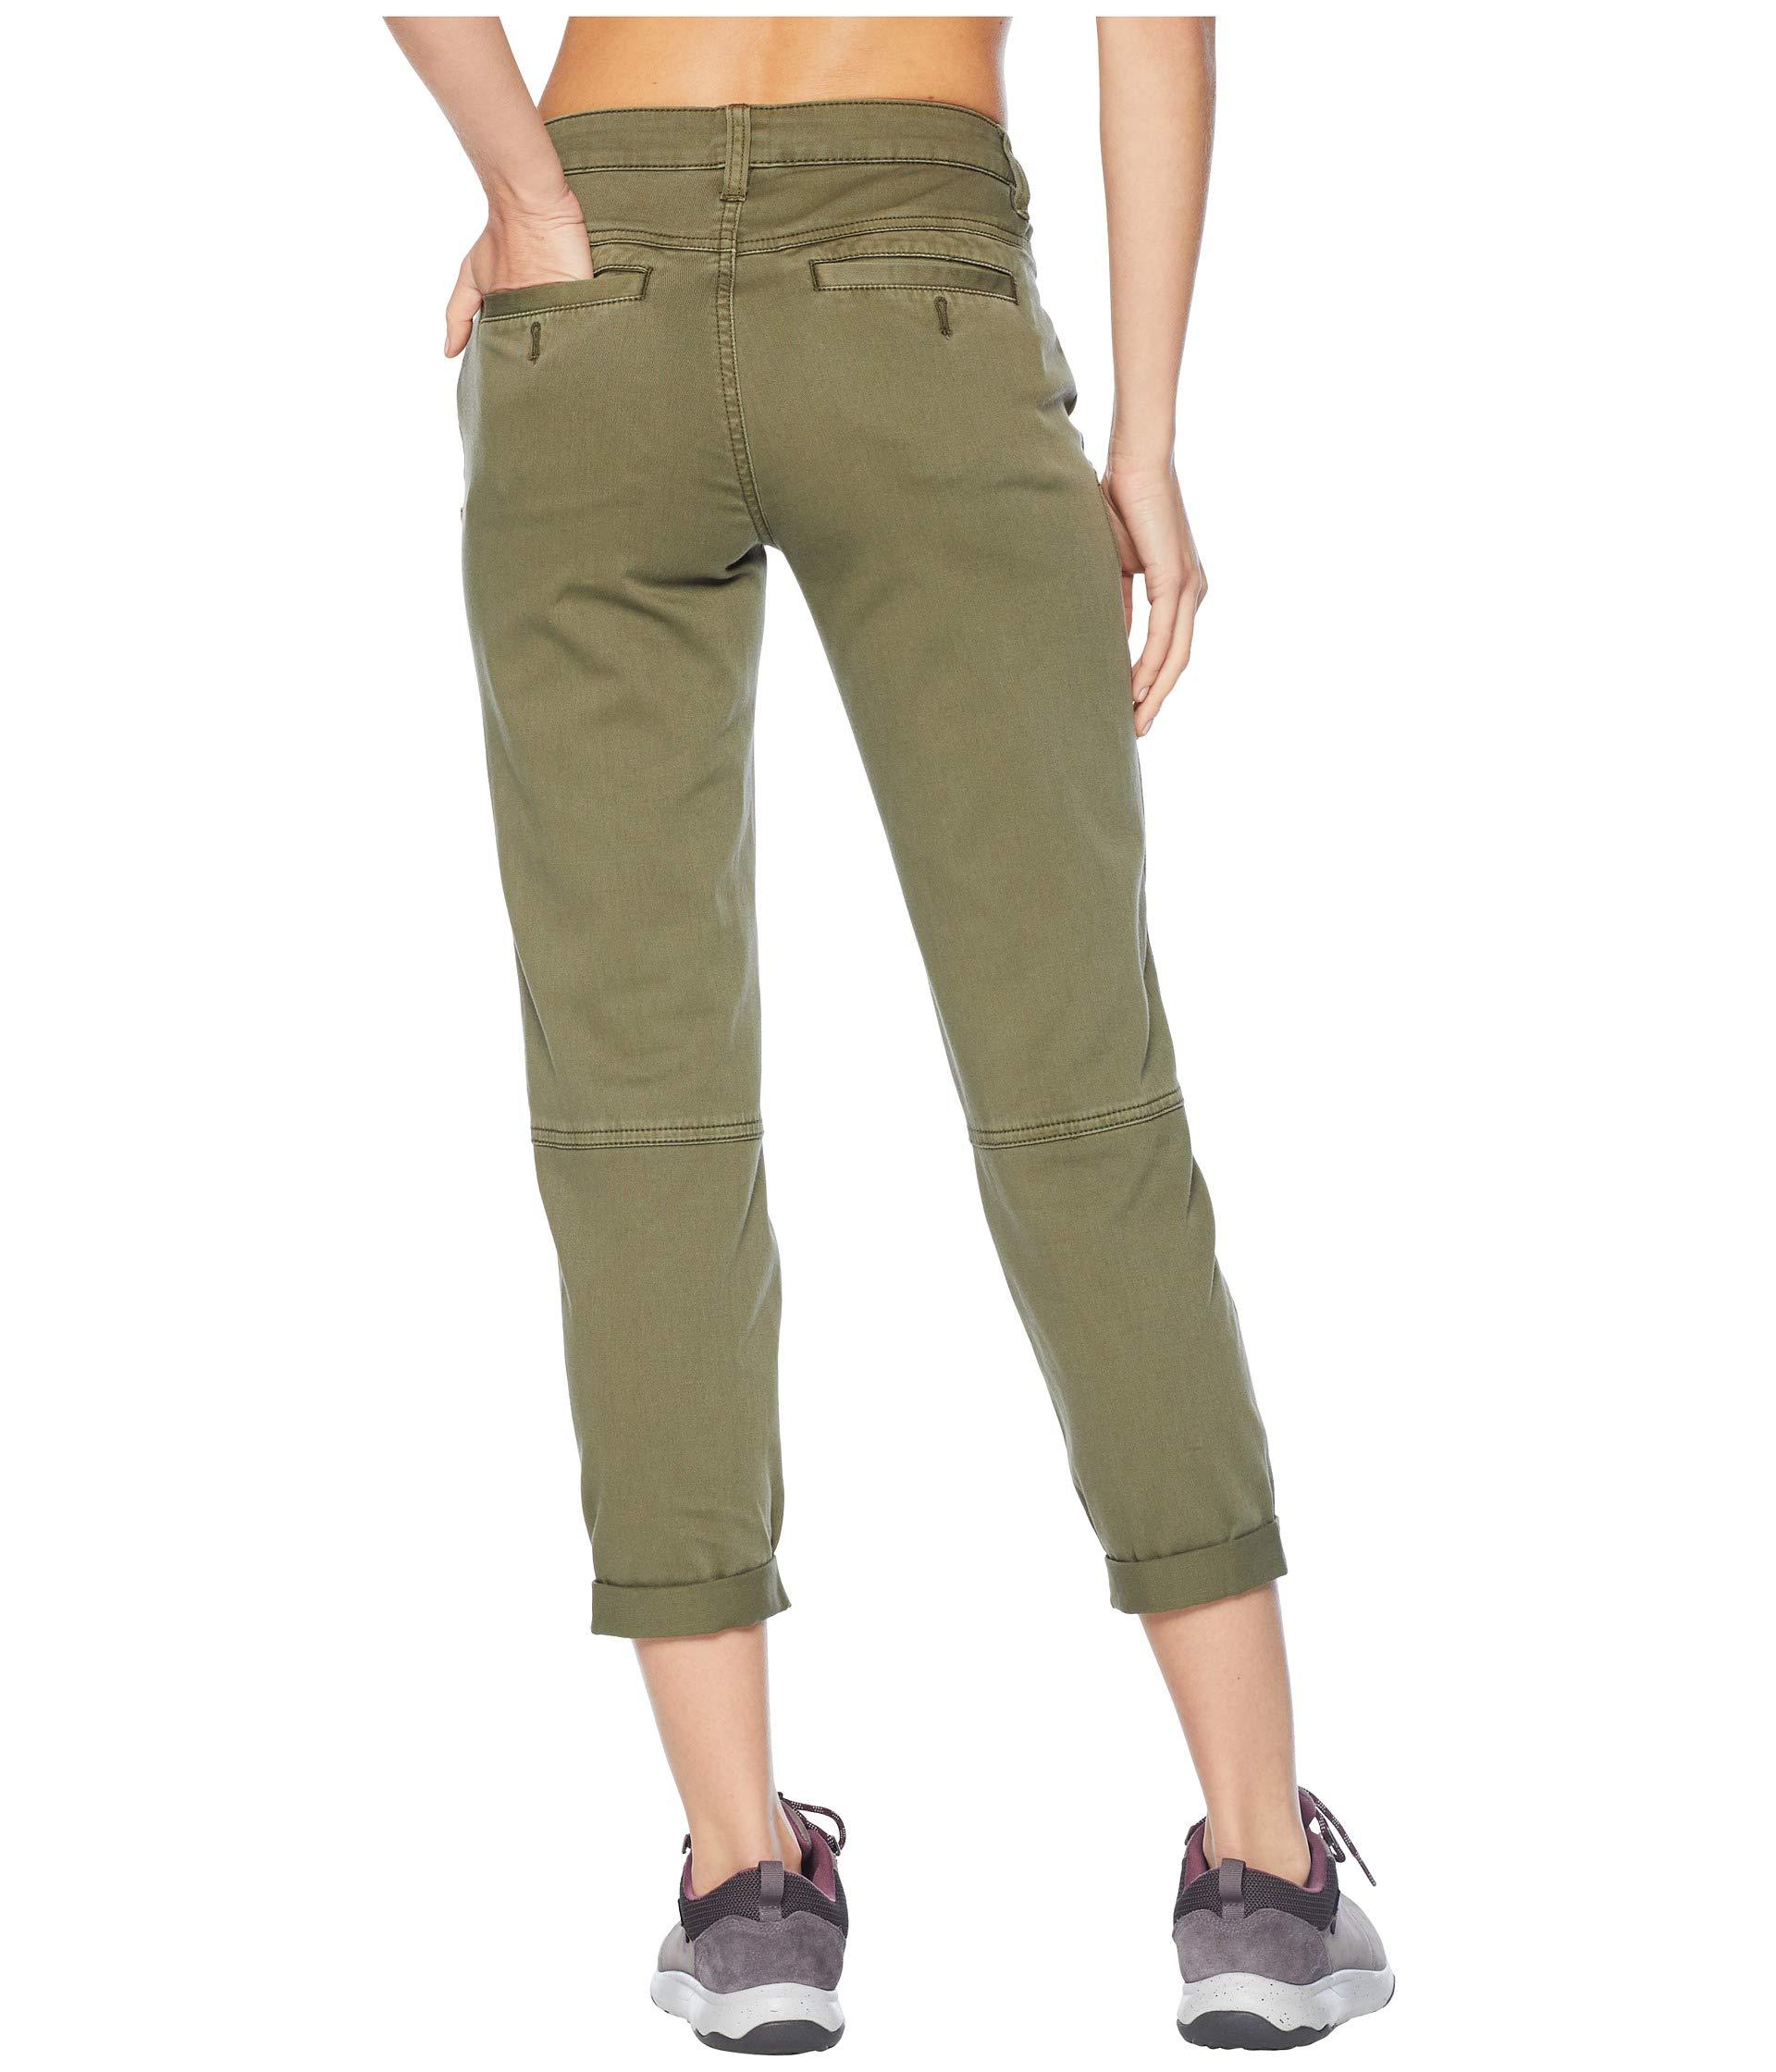 Green Prana Pants Prana Cargo Janessa Janessa w6FxvzFX